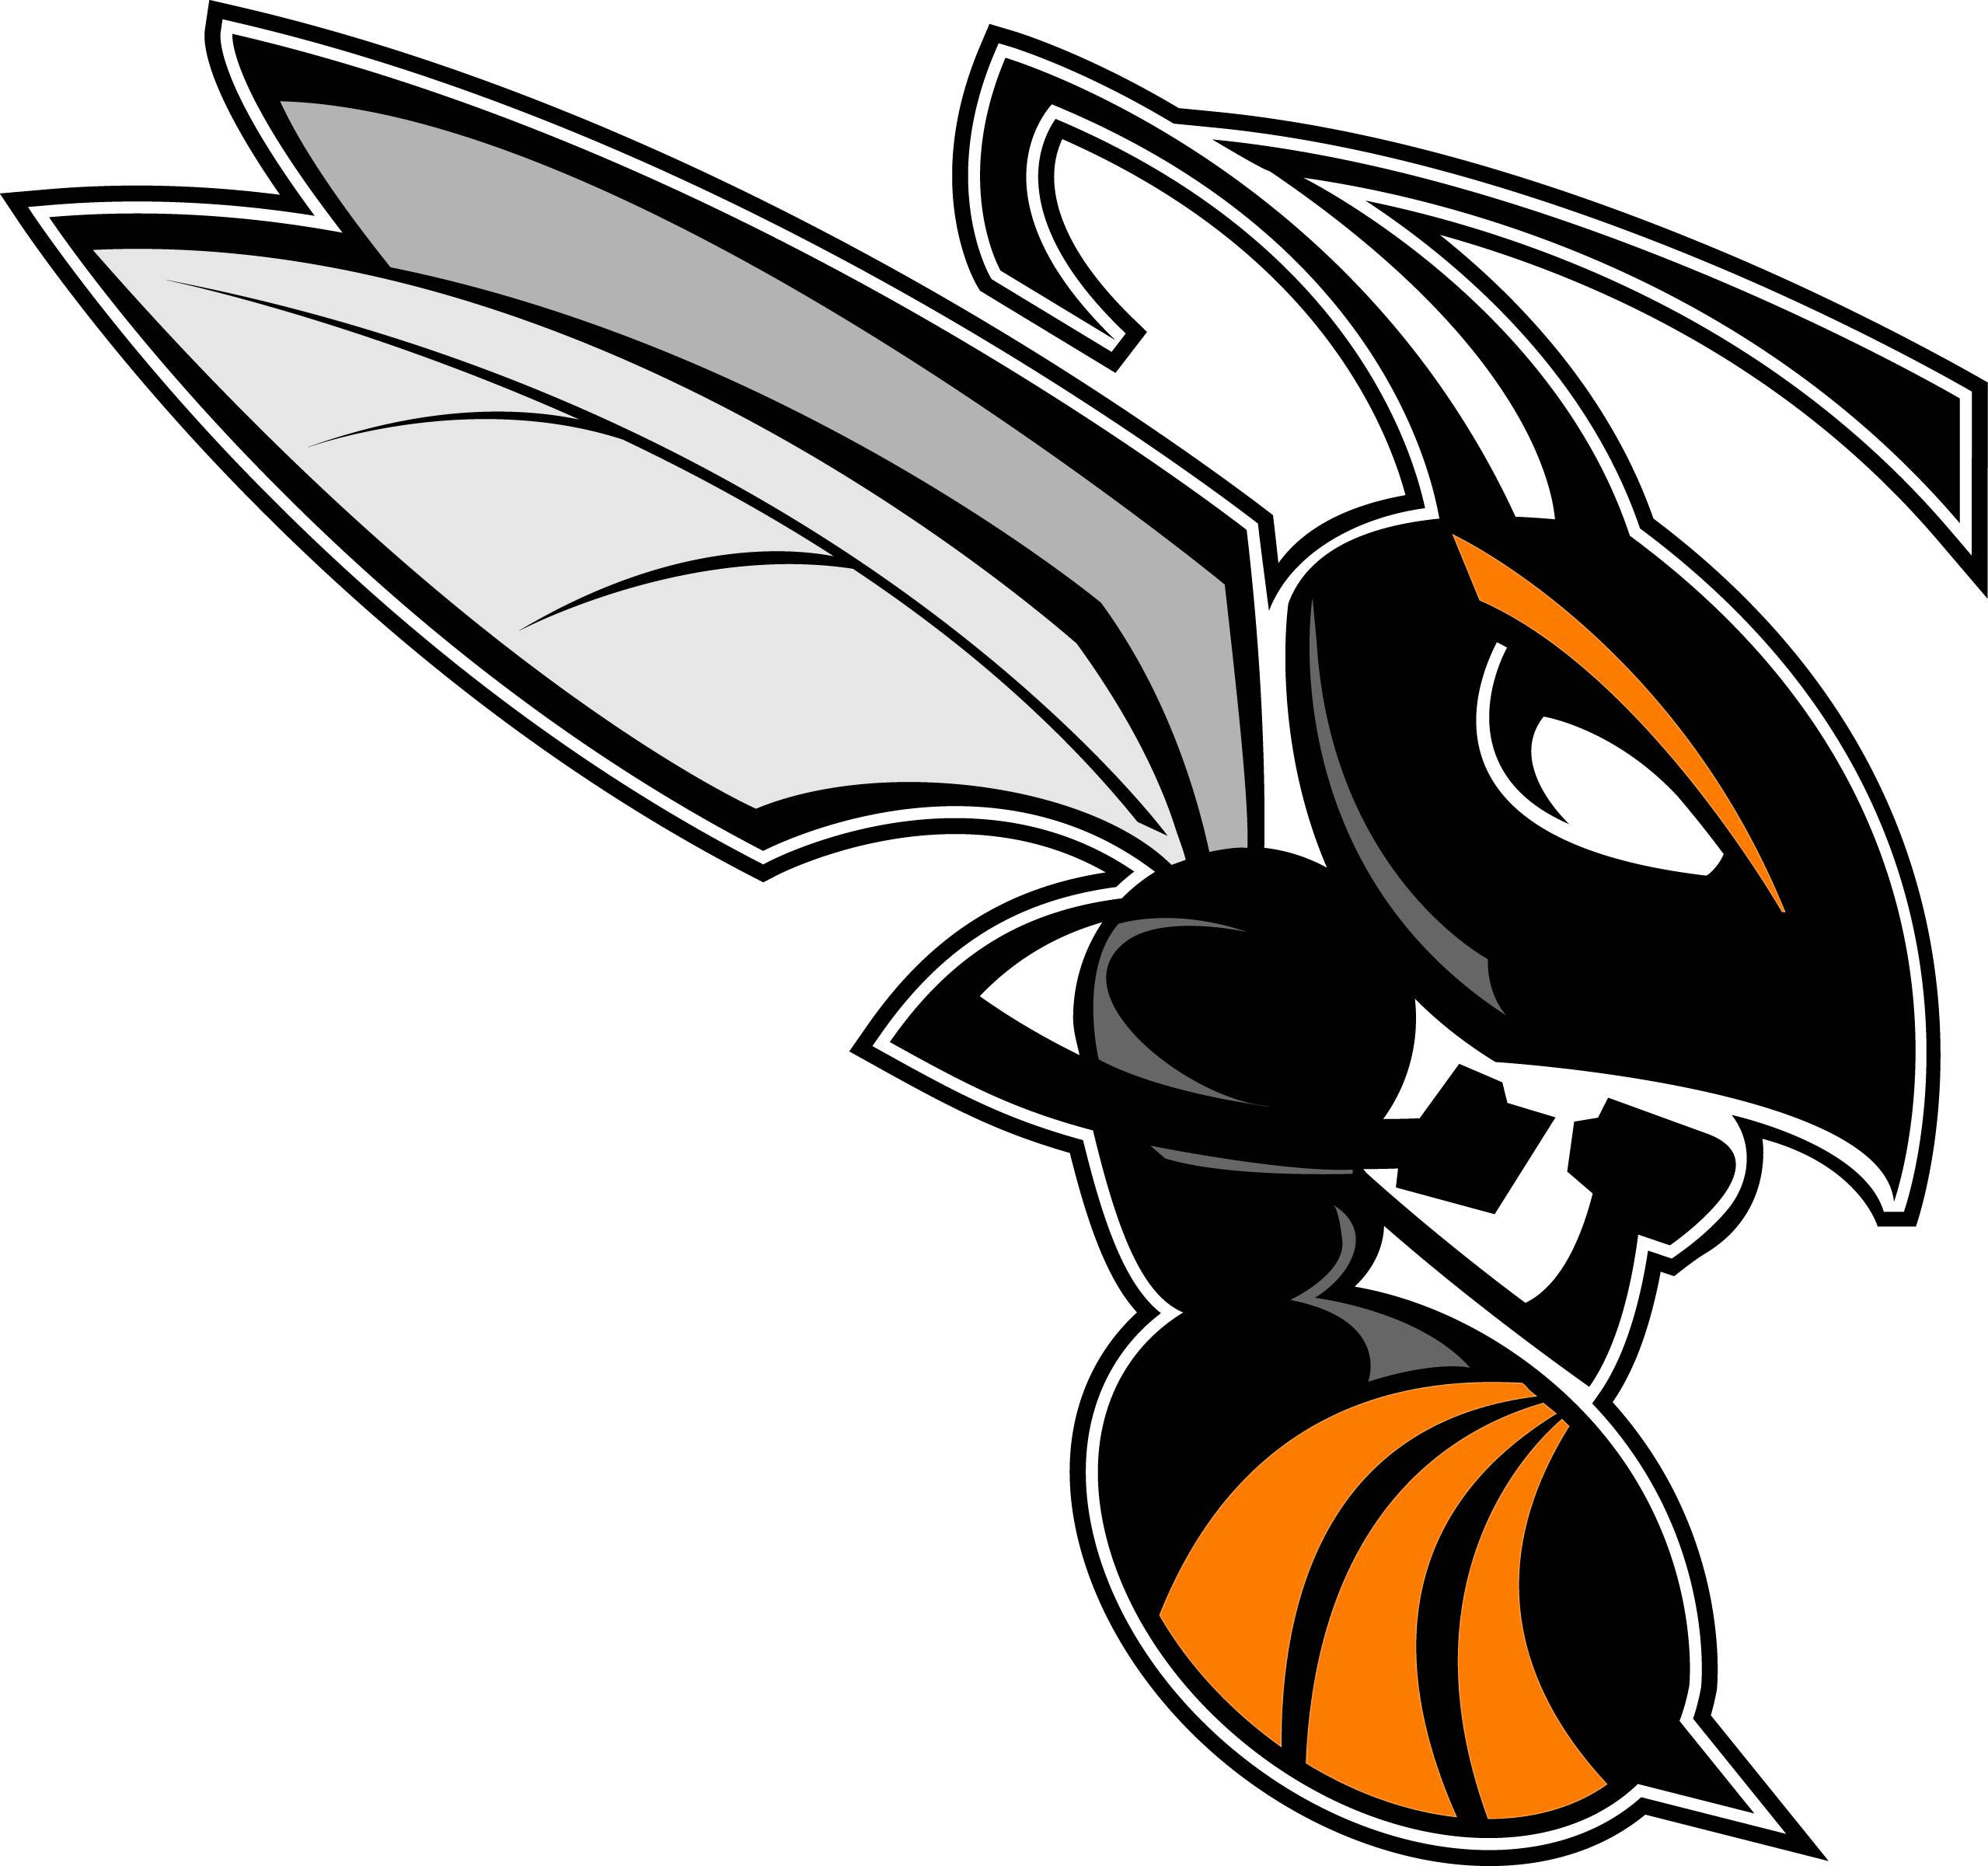 Wasps clipart emblem image black and white stock Hornet logo clipart - WikiClipArt image black and white stock